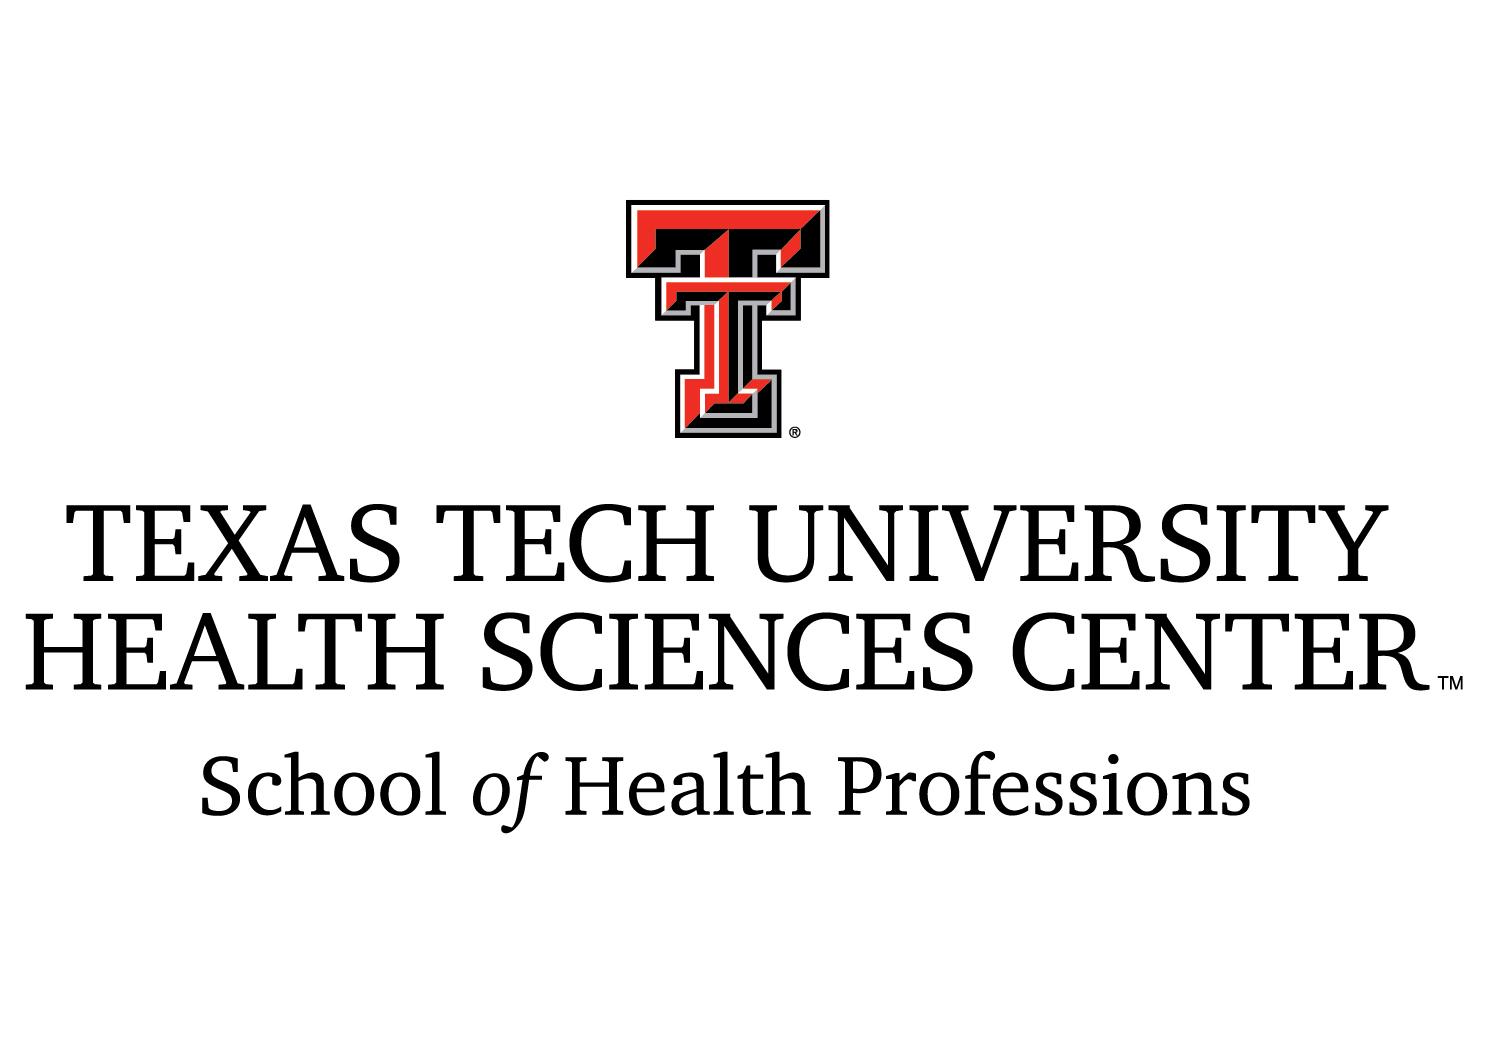 Texas Tech University Health Sciences Center In Texas Tech School Of Law Calendar